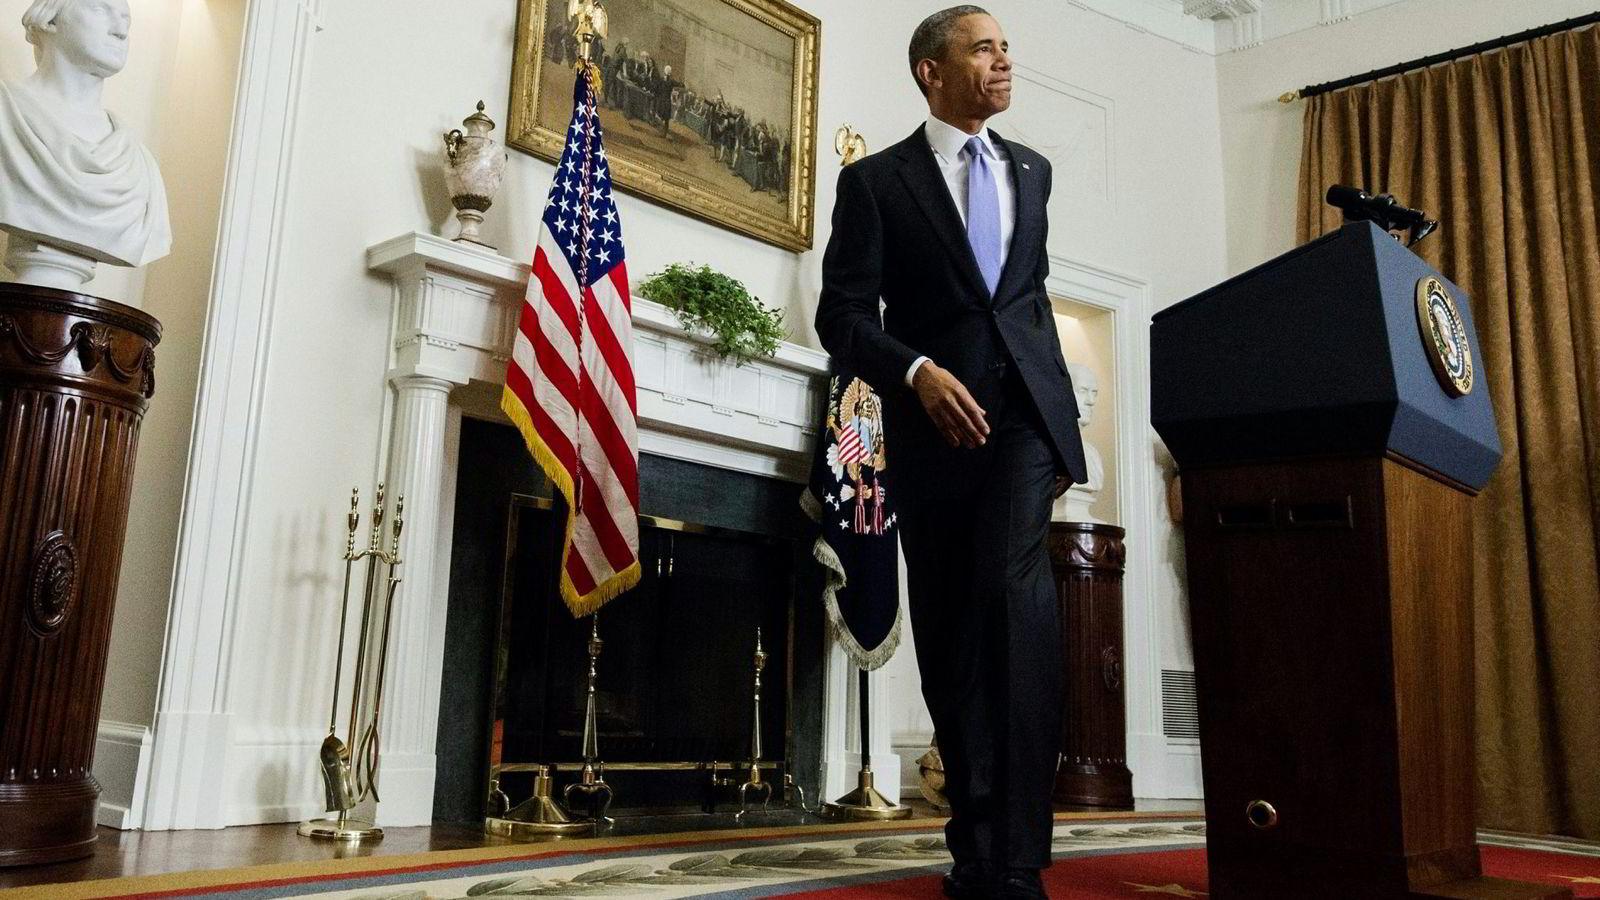 USAs president Barack Obama. Foto: Saul Loeb, AFP/NTB Scanpix